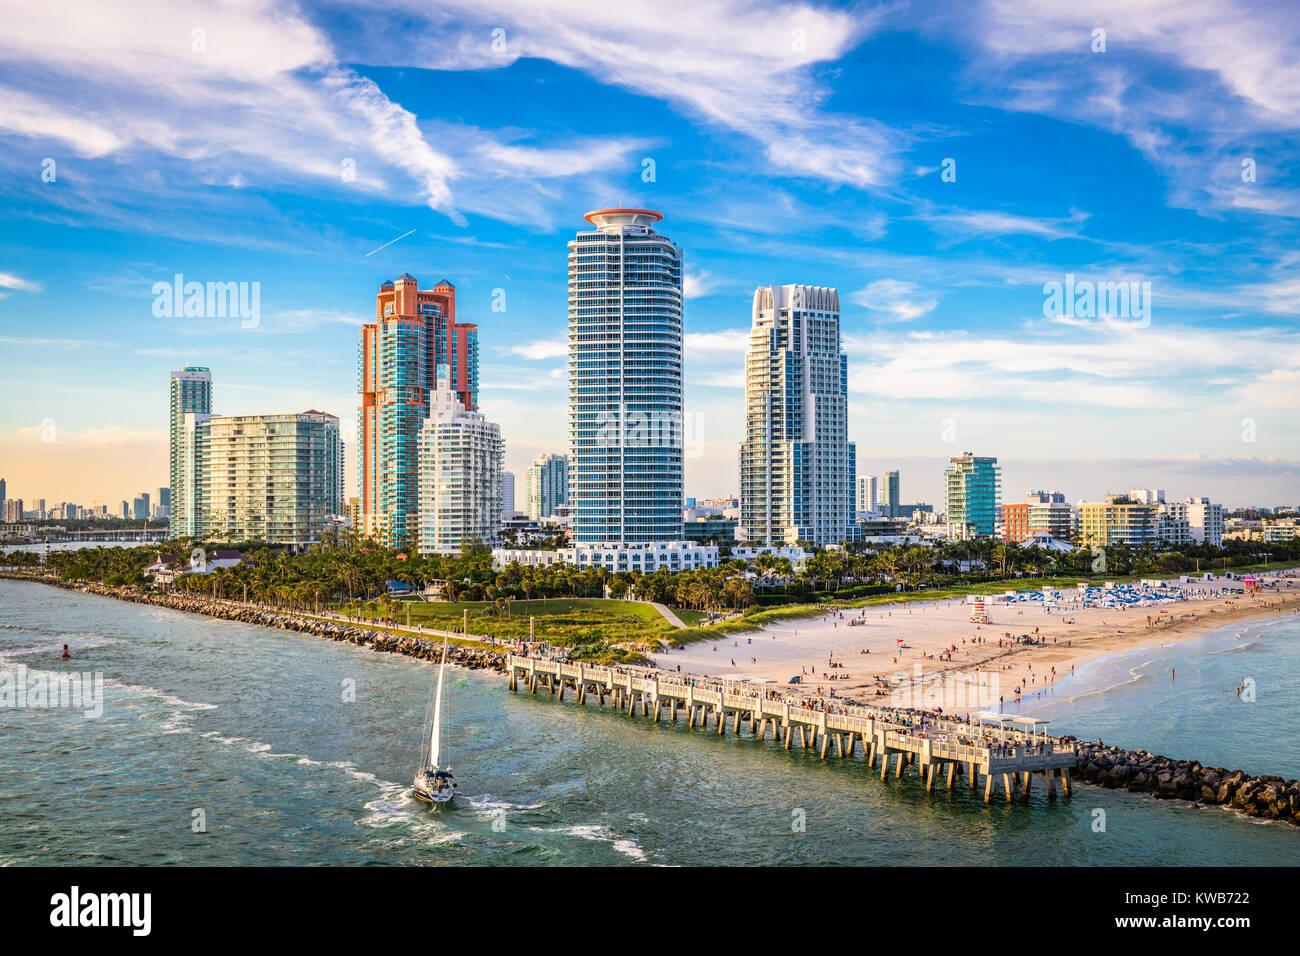 South Beach, Miami, Florida, USA over South Pointe Park. - Stock Image